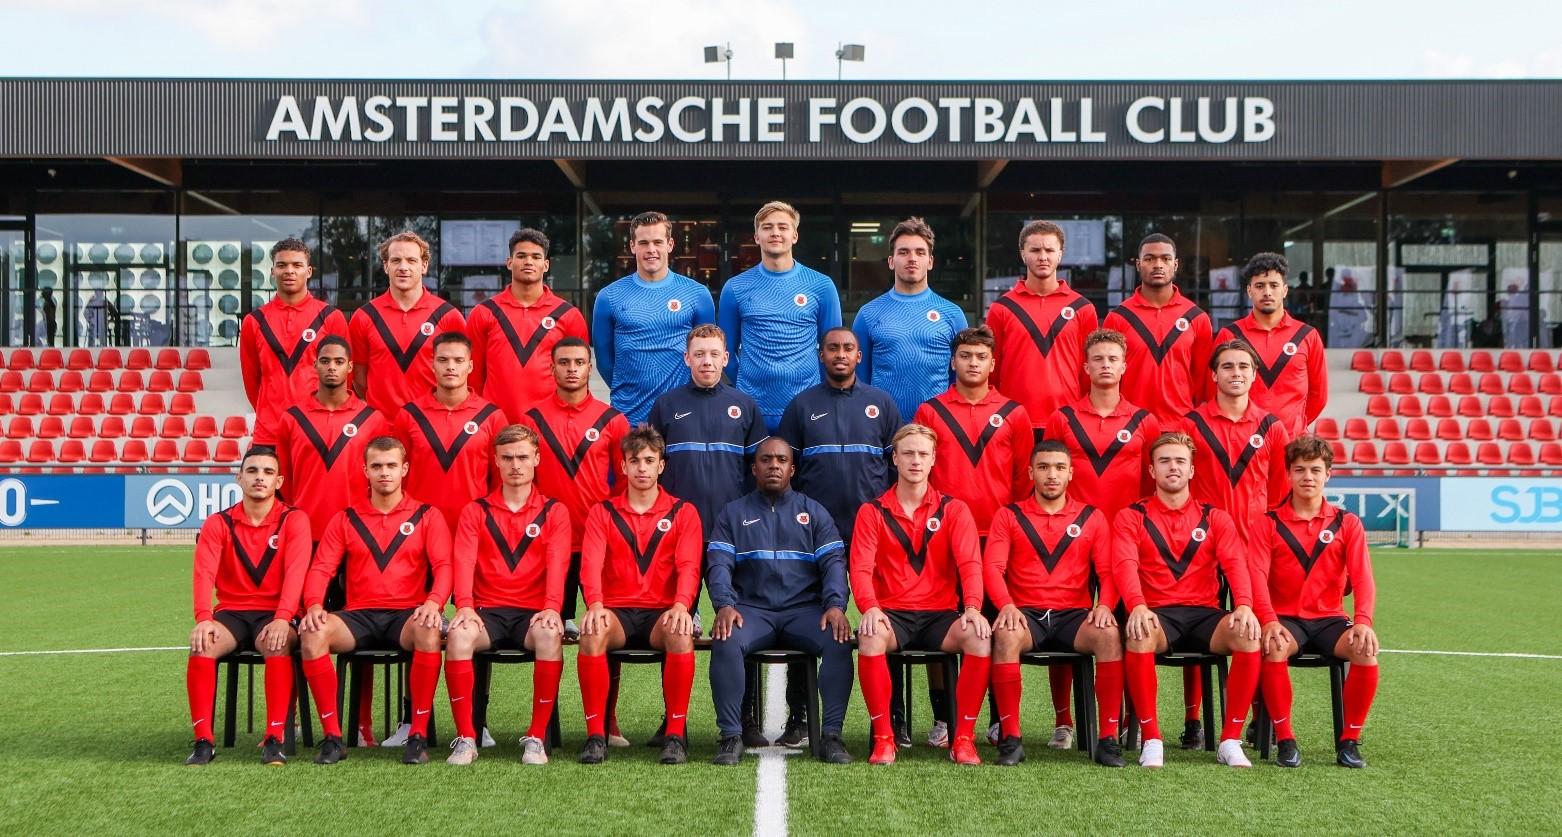 Teamfoto AFC AFC Onder 21